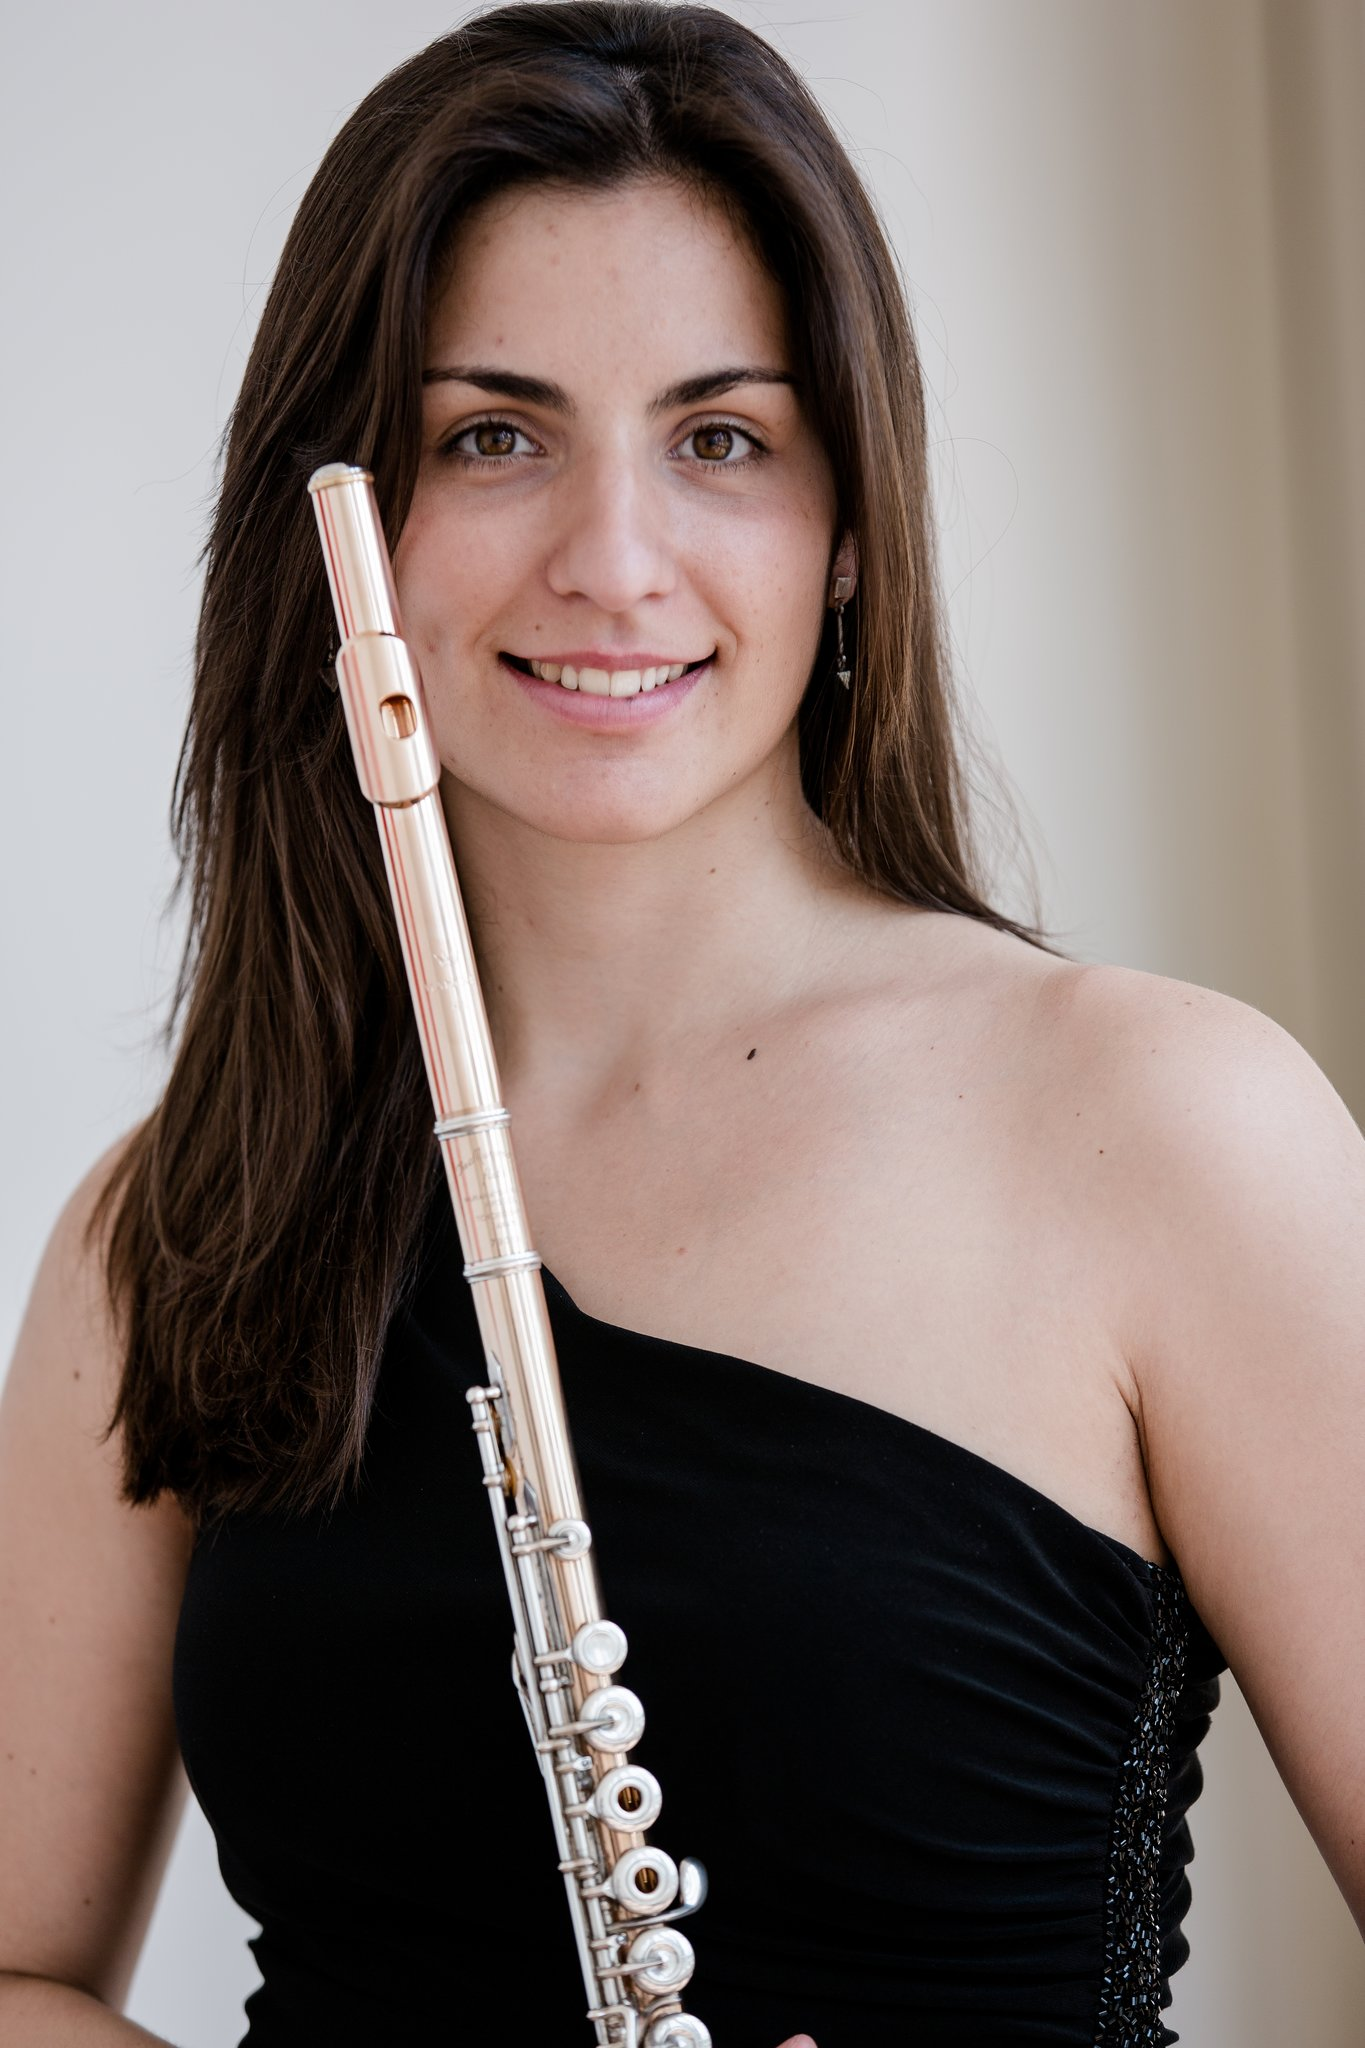 Flöte Alba Luna Sanz Juanas, West Eastern Divan Orchestra Daniel Barenboim Mozart Flötenquartette Matthias Bruns Sonos Trio Mercator Ensemble